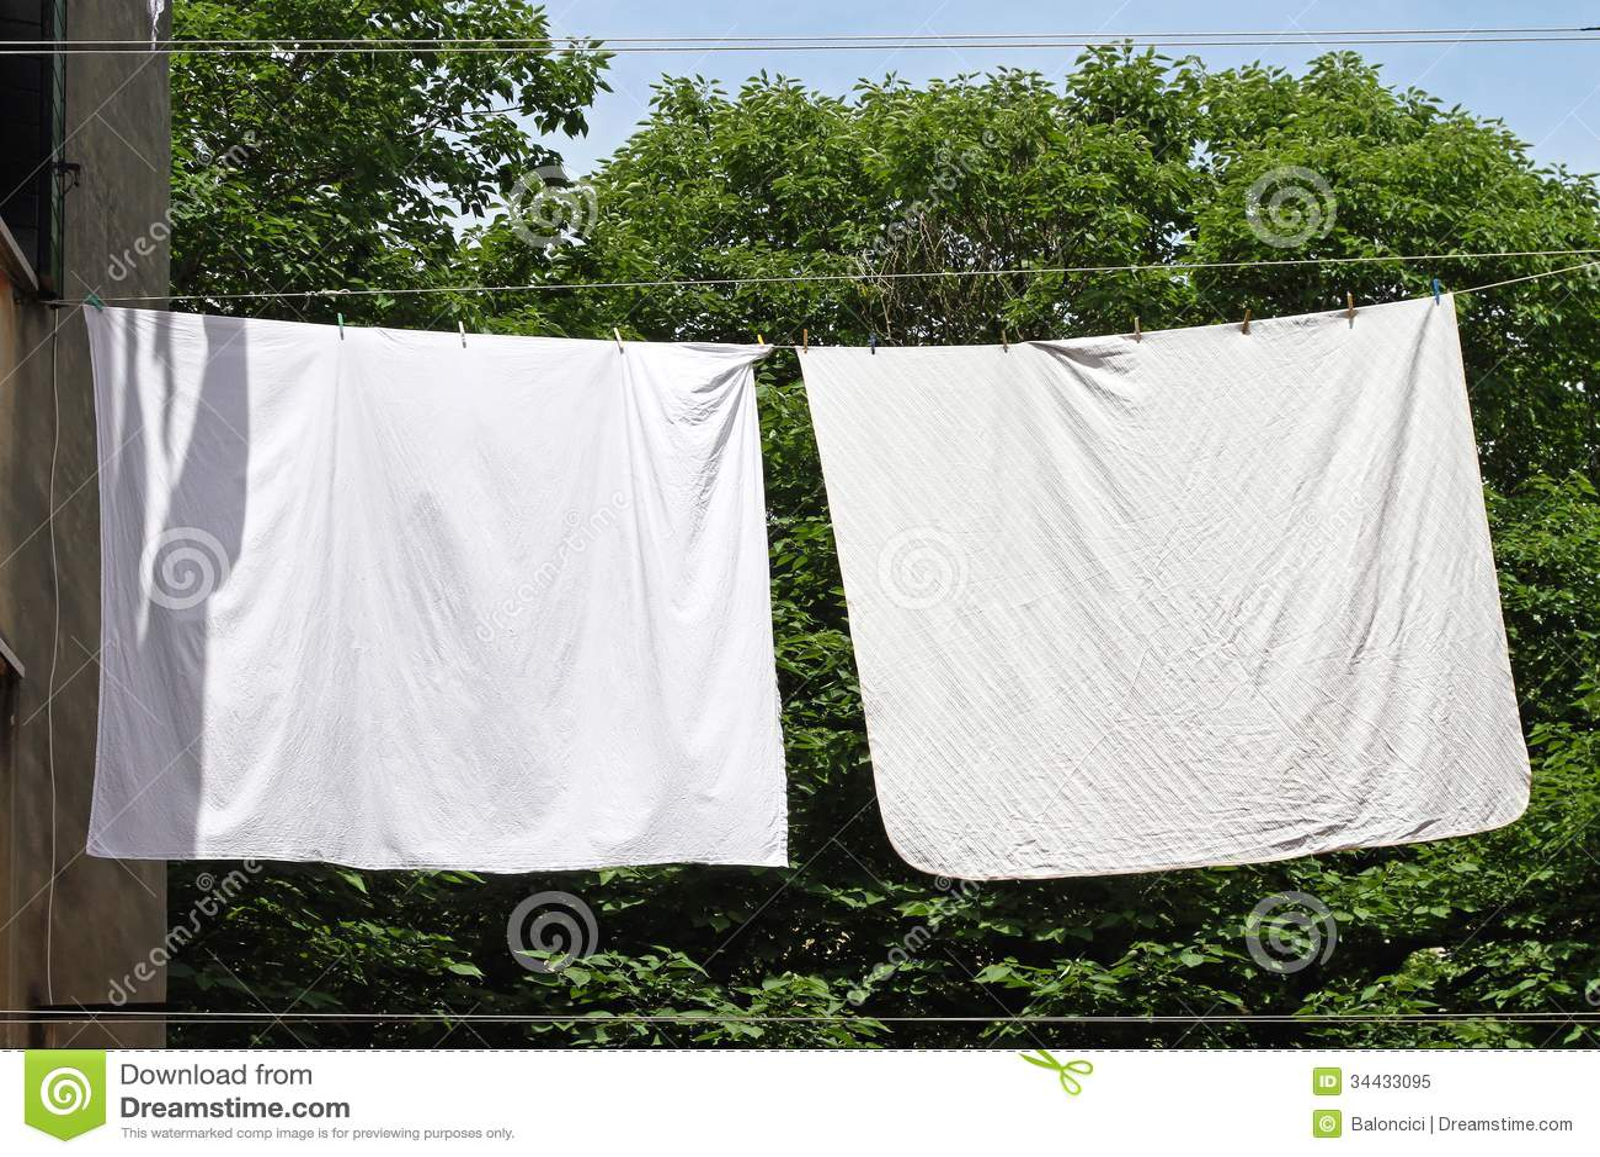 Bed sheet hanging - Royalty Free Stock Photo